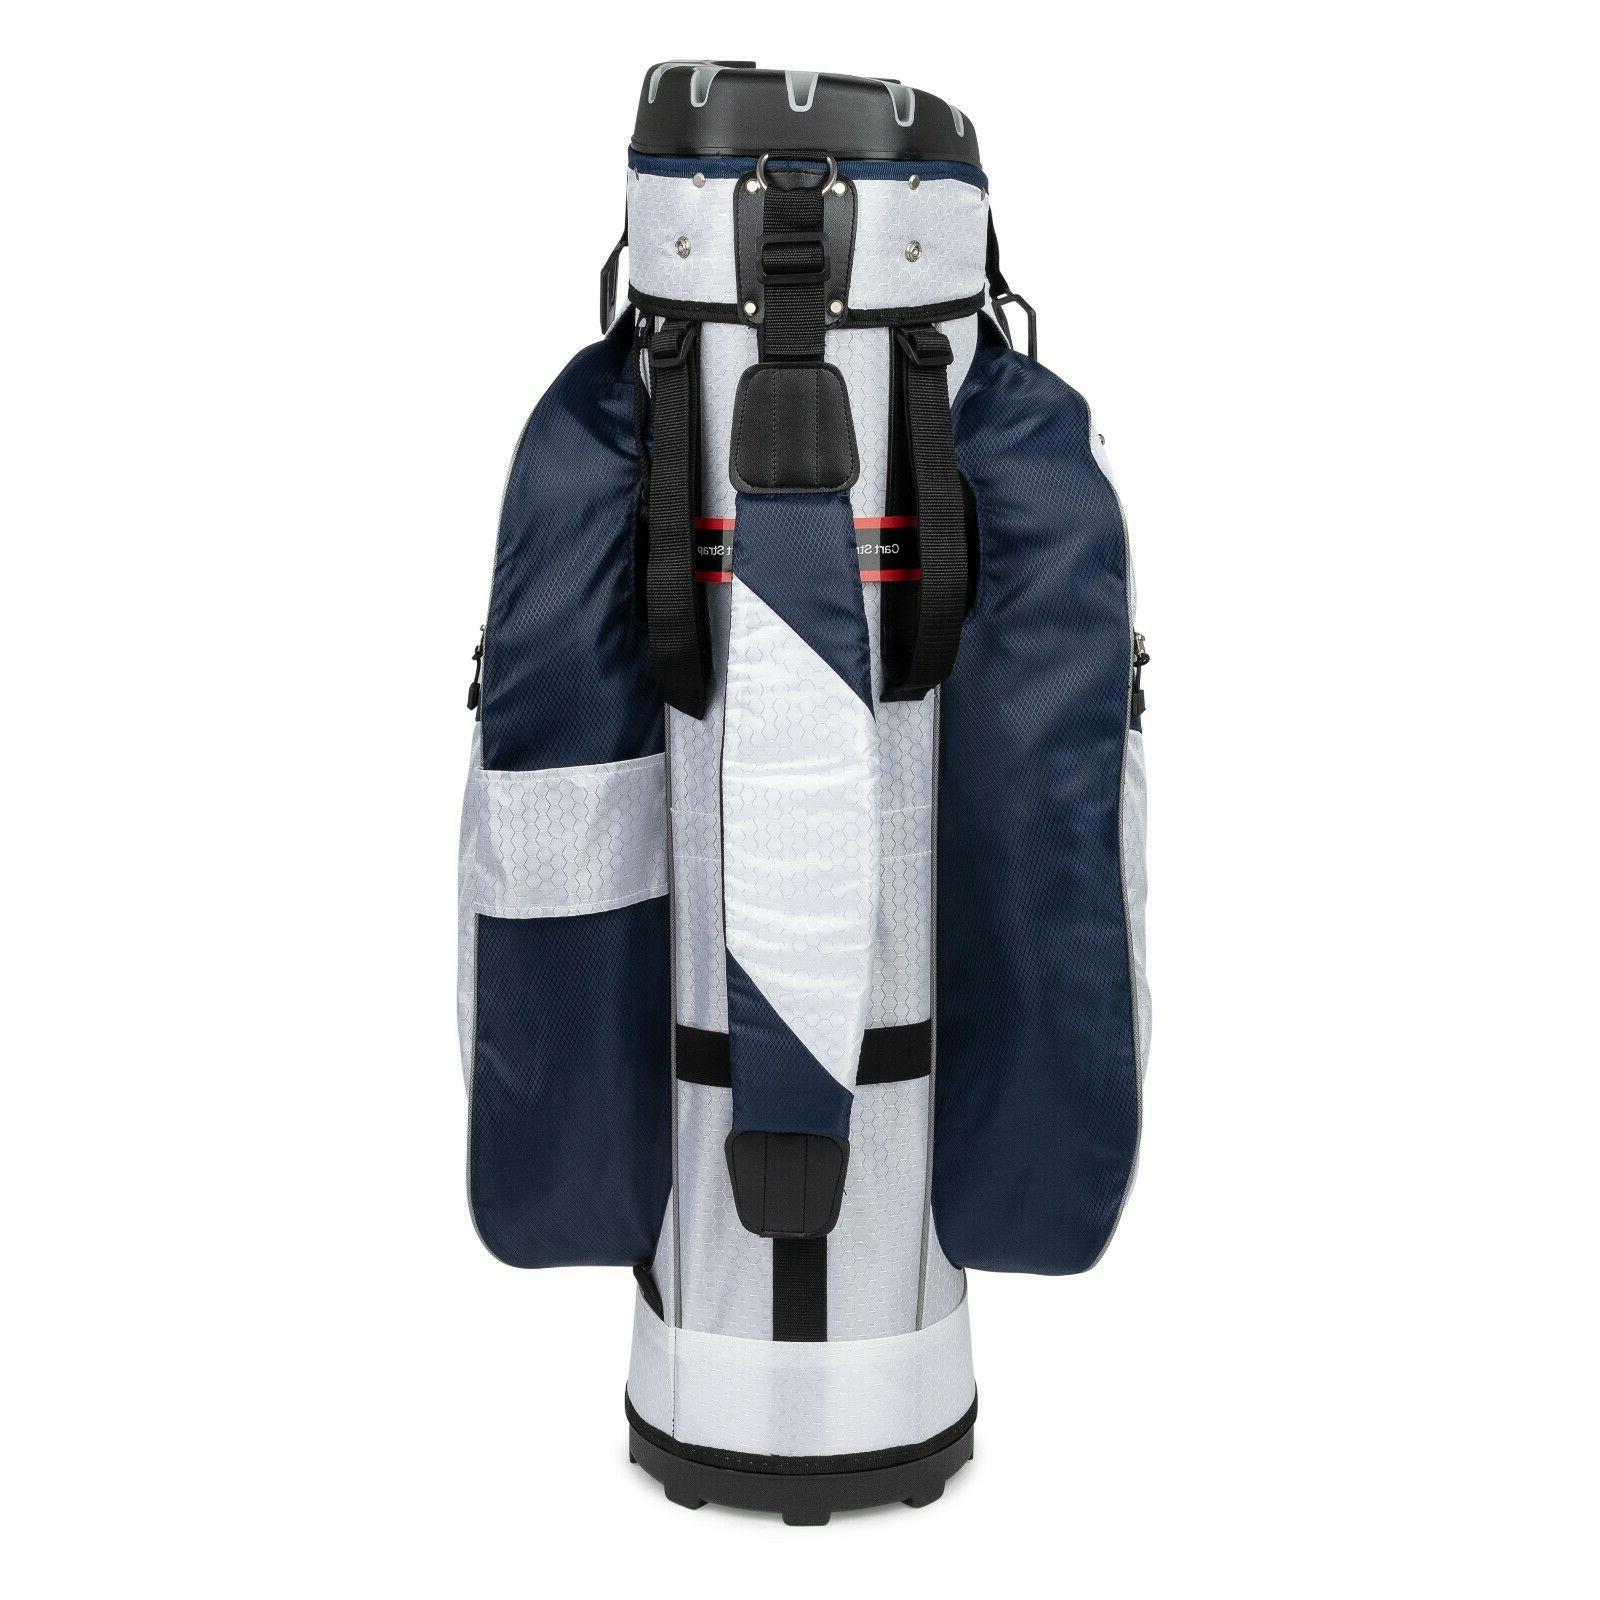 Founders Club 3G 14 Way Golf Cart Bag Length Dividers